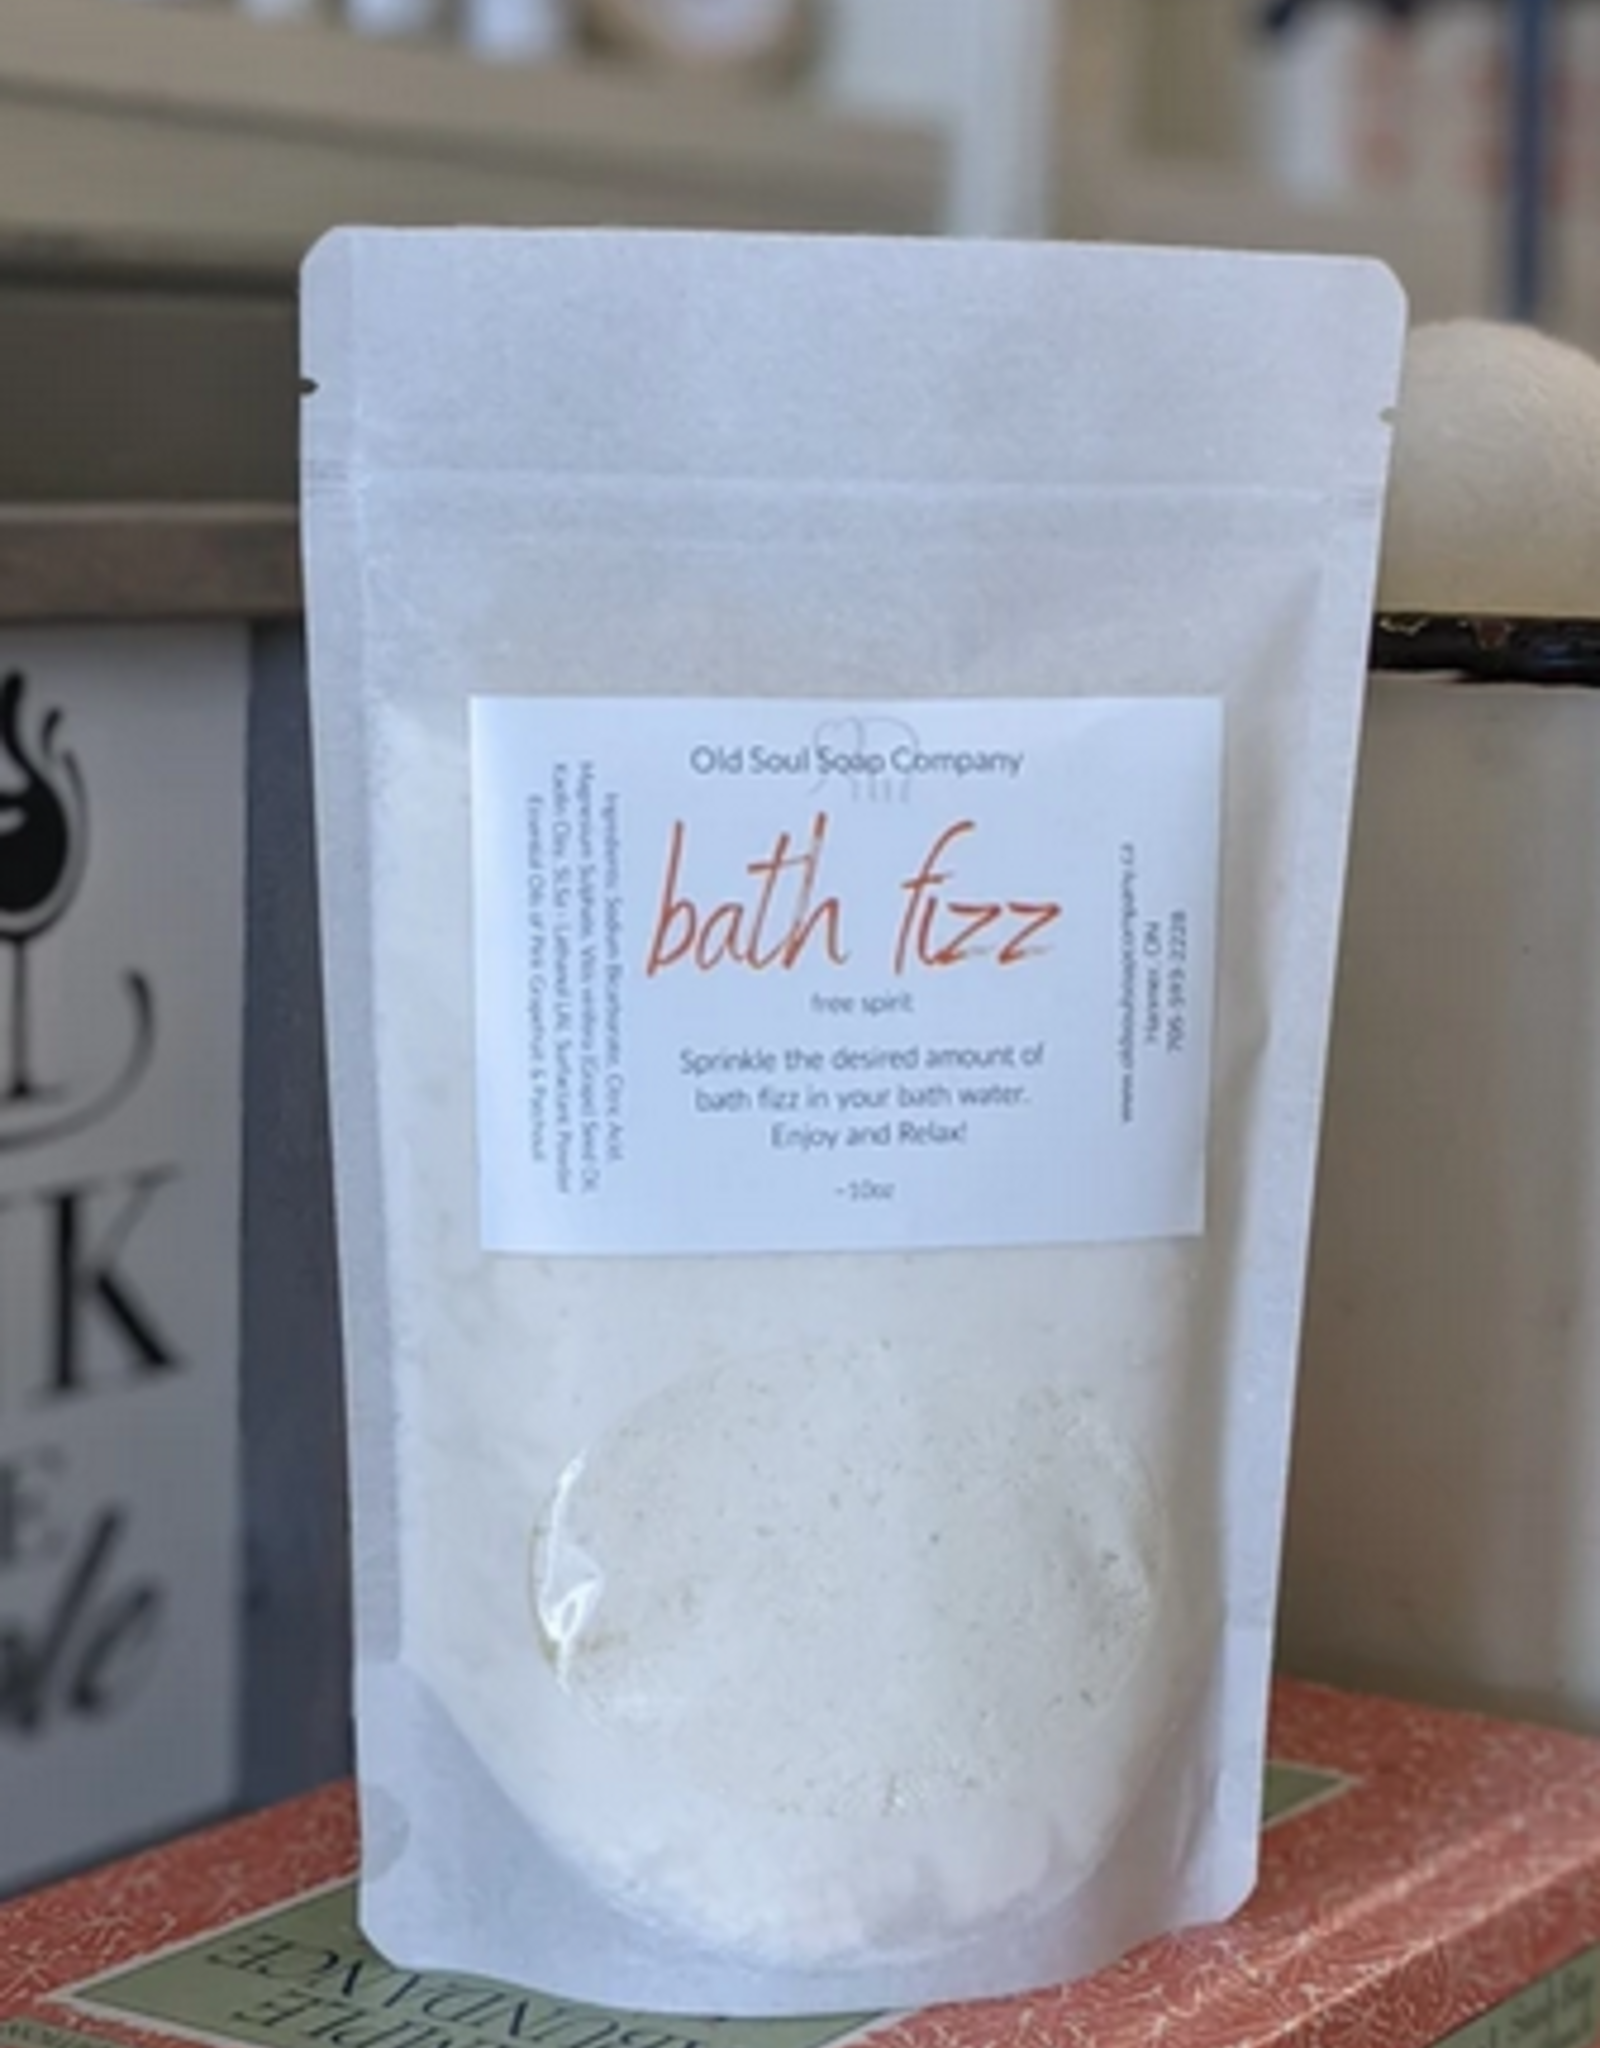 Old Soul Soap Company Bath Fizz